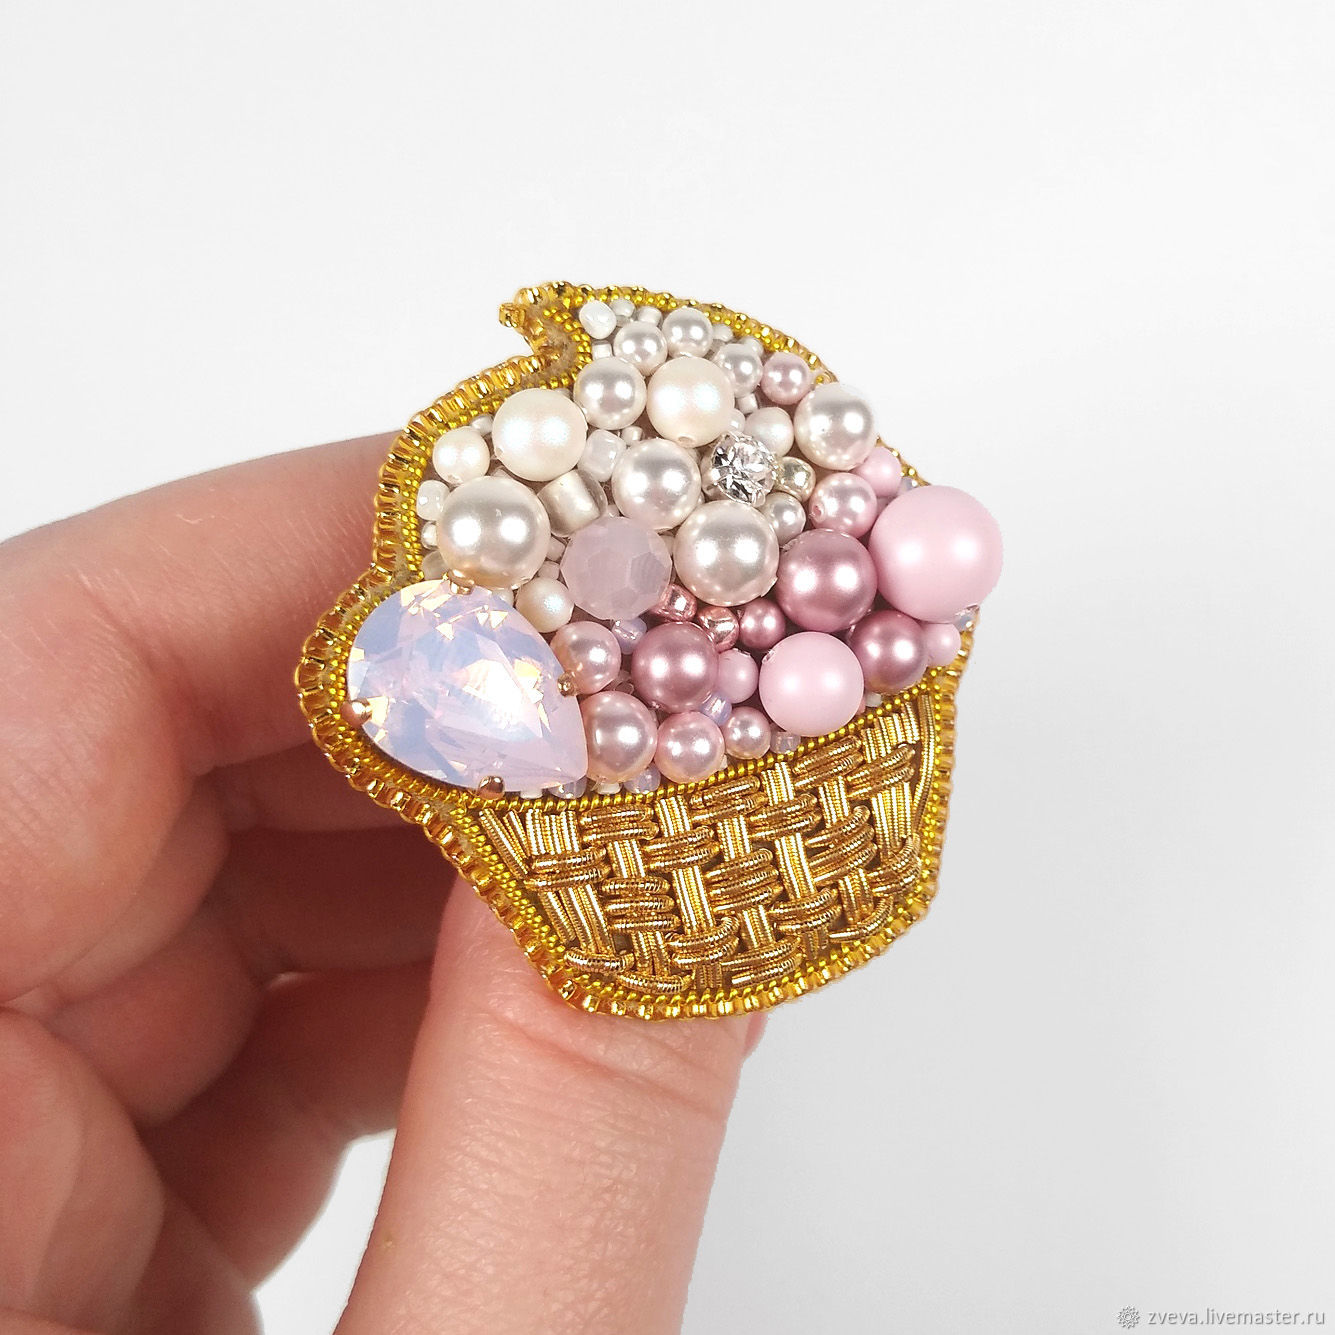 Brooch of beads Cupcake cake pink, brooch sweetness, Brooches, Smolensk,  Фото №1